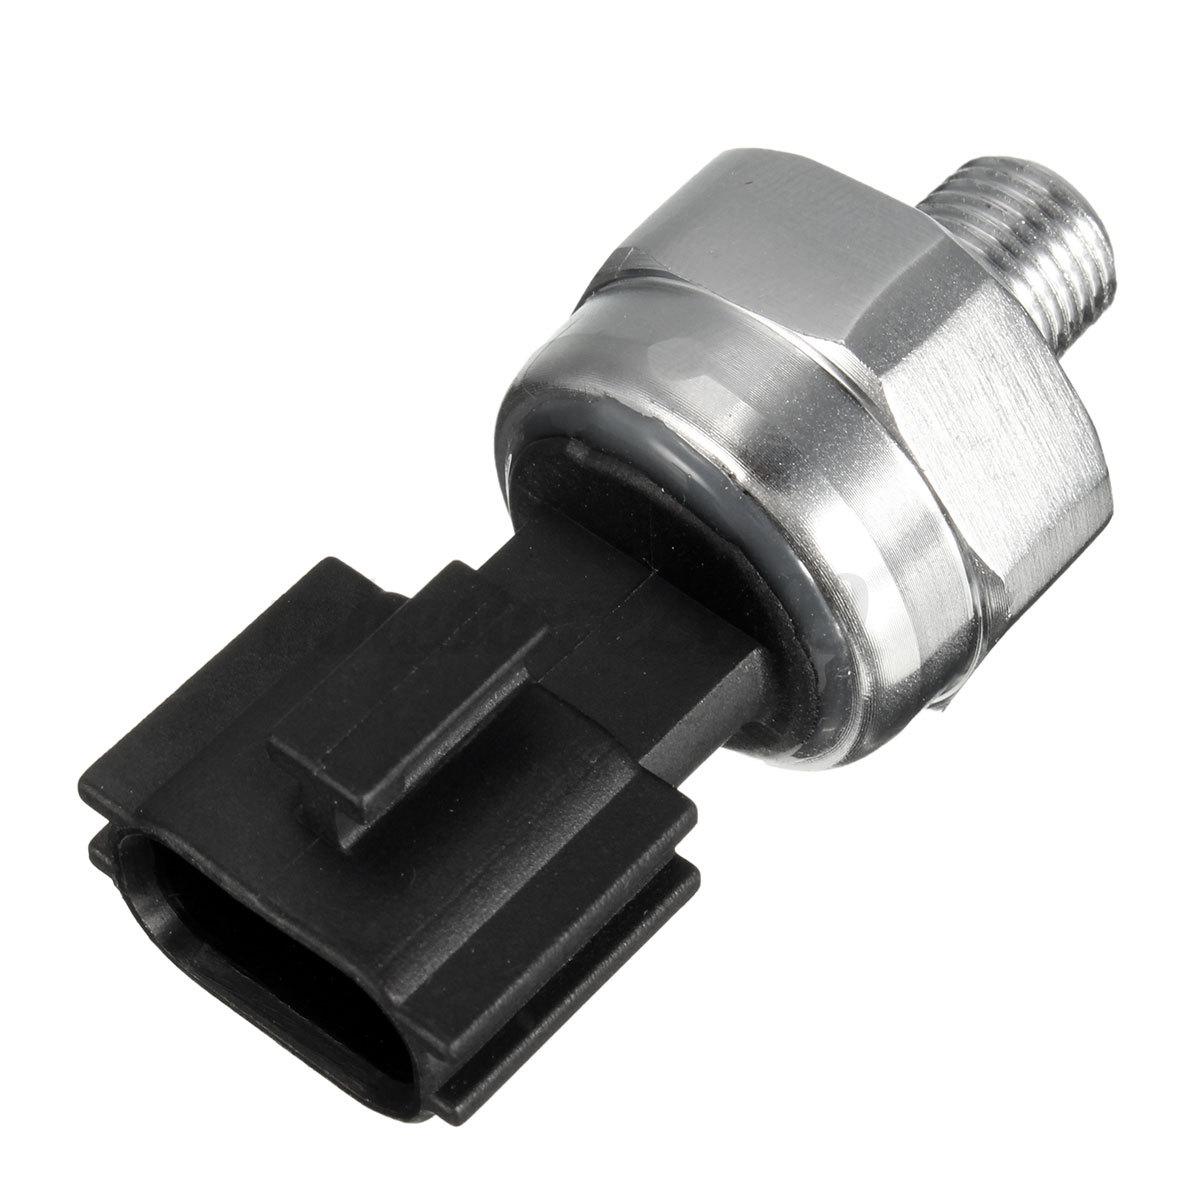 Nissan Oil Pressure Switch Wiring Diagrams 25070 Cd00a Sensor Sender For Cummins Isx